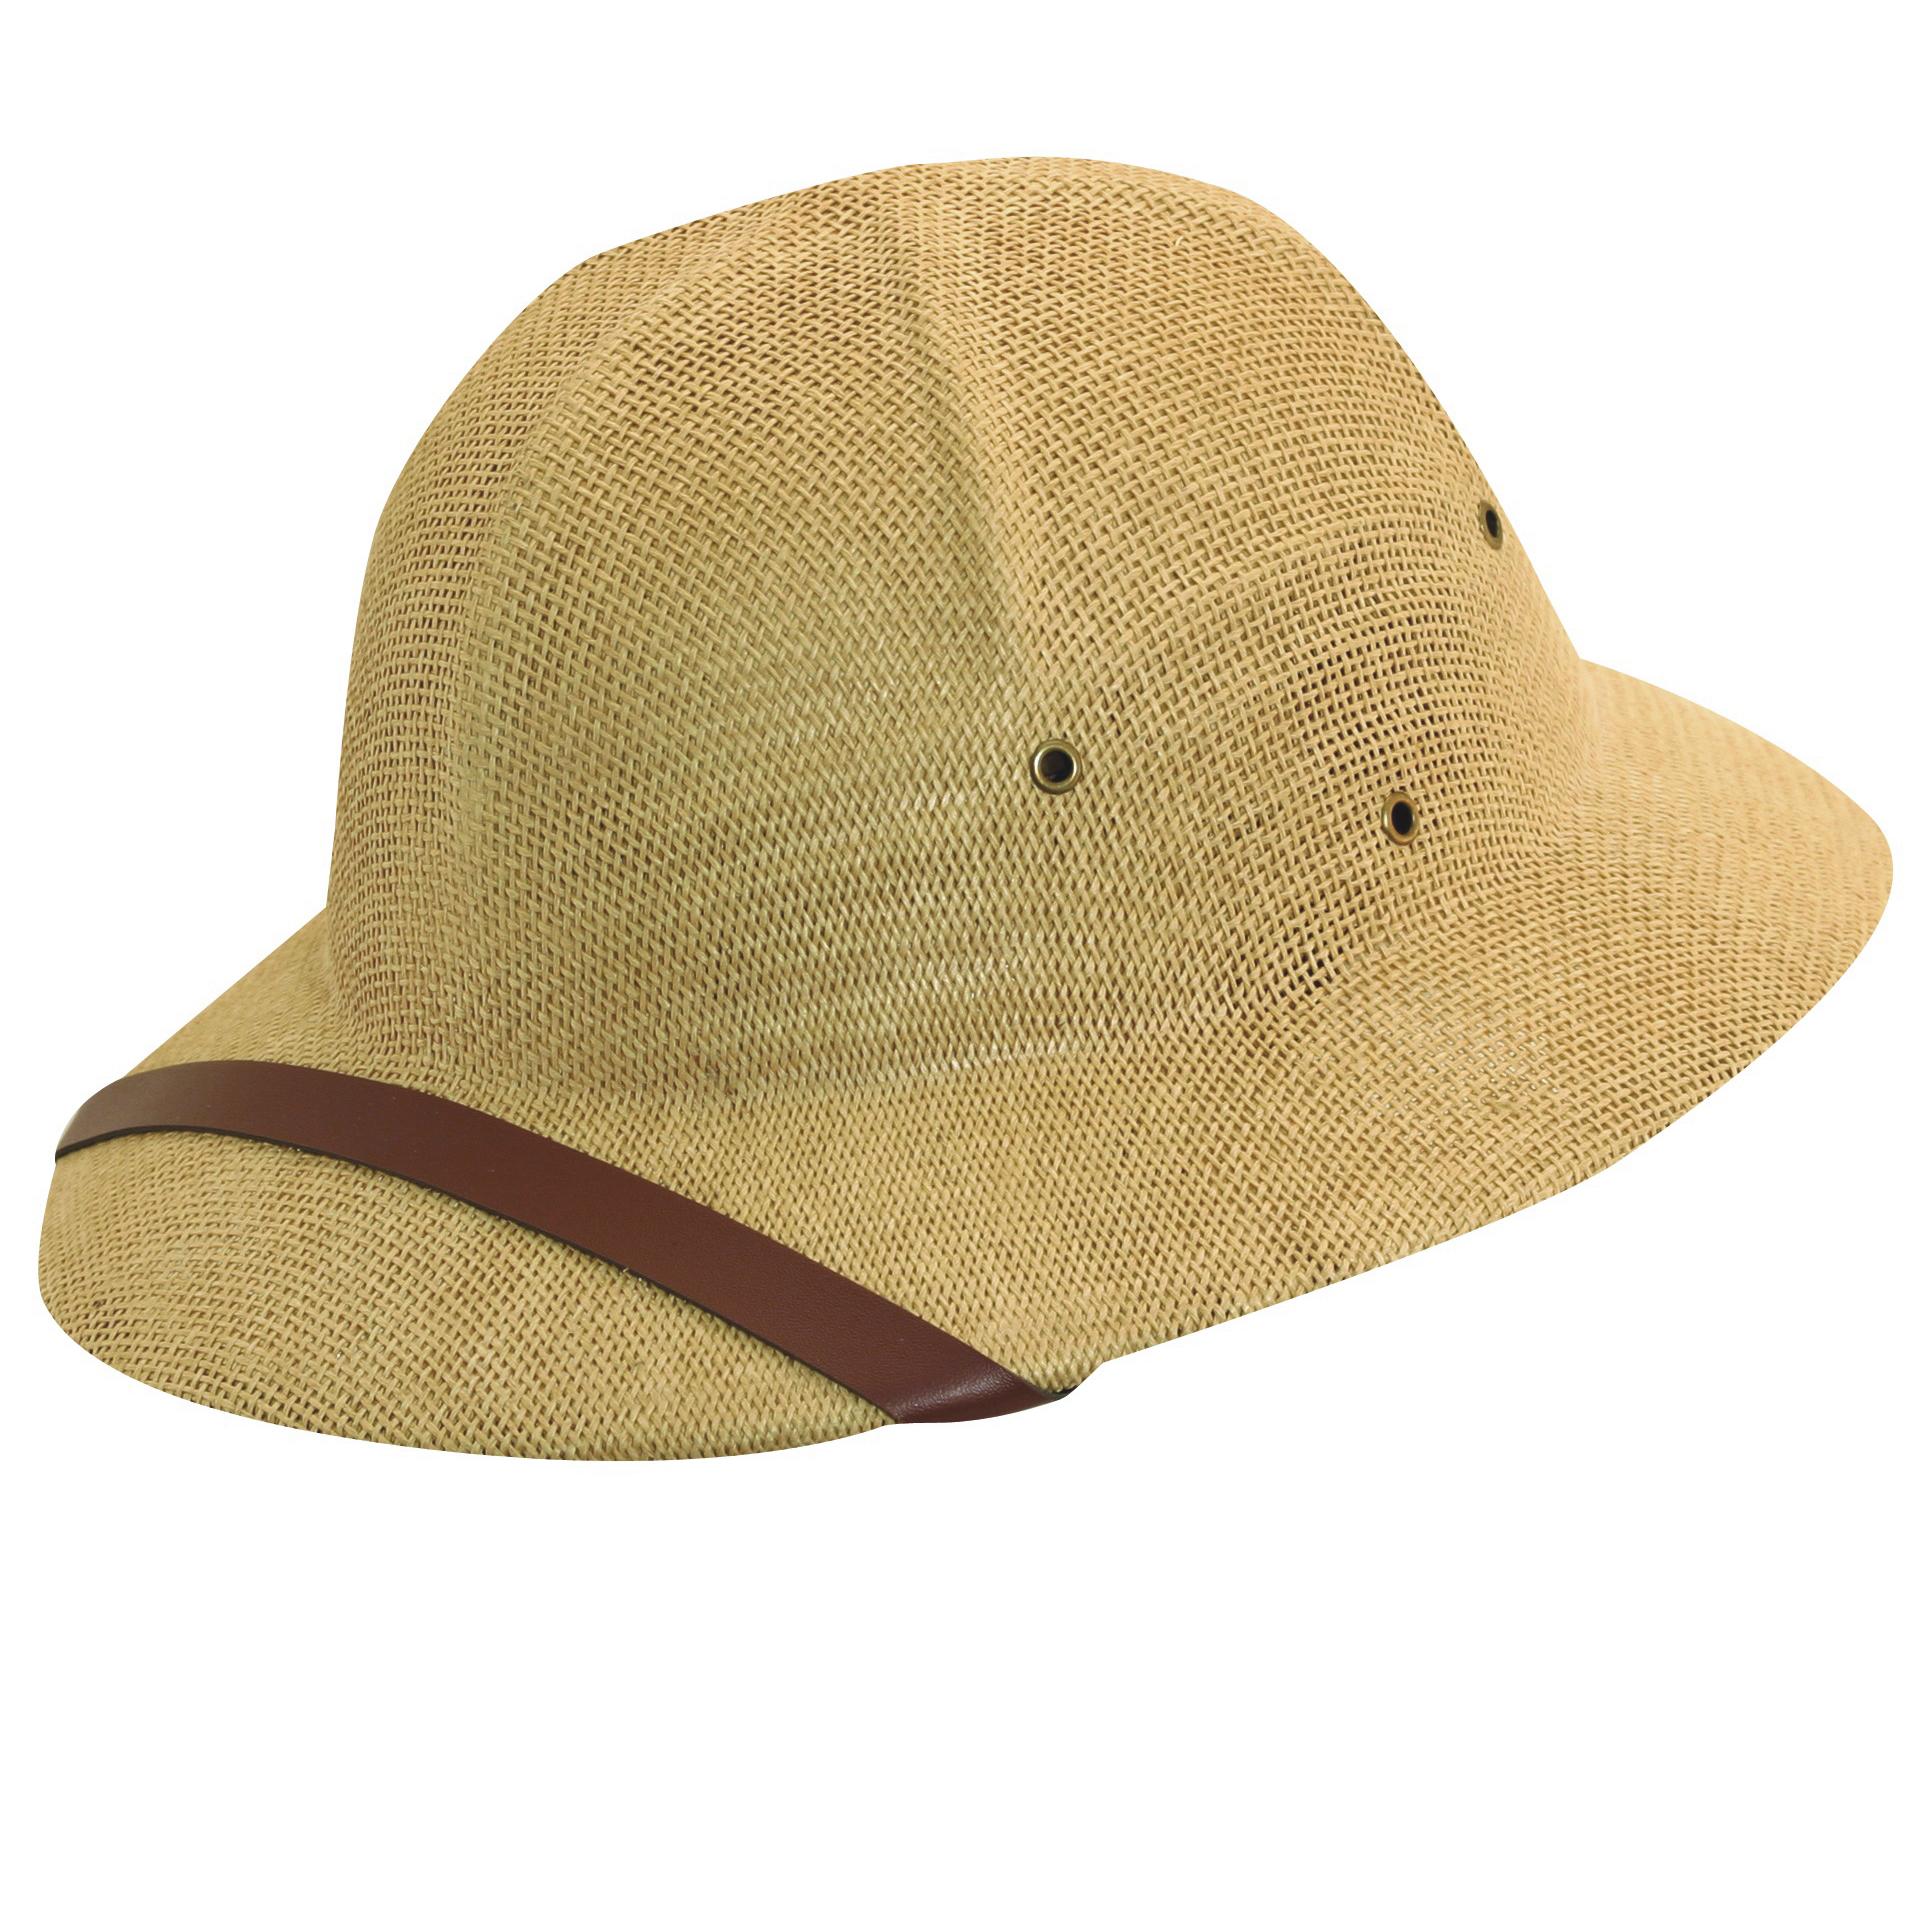 DPC Twisted Fine Toyo Pith Helmet | Explorer Hats